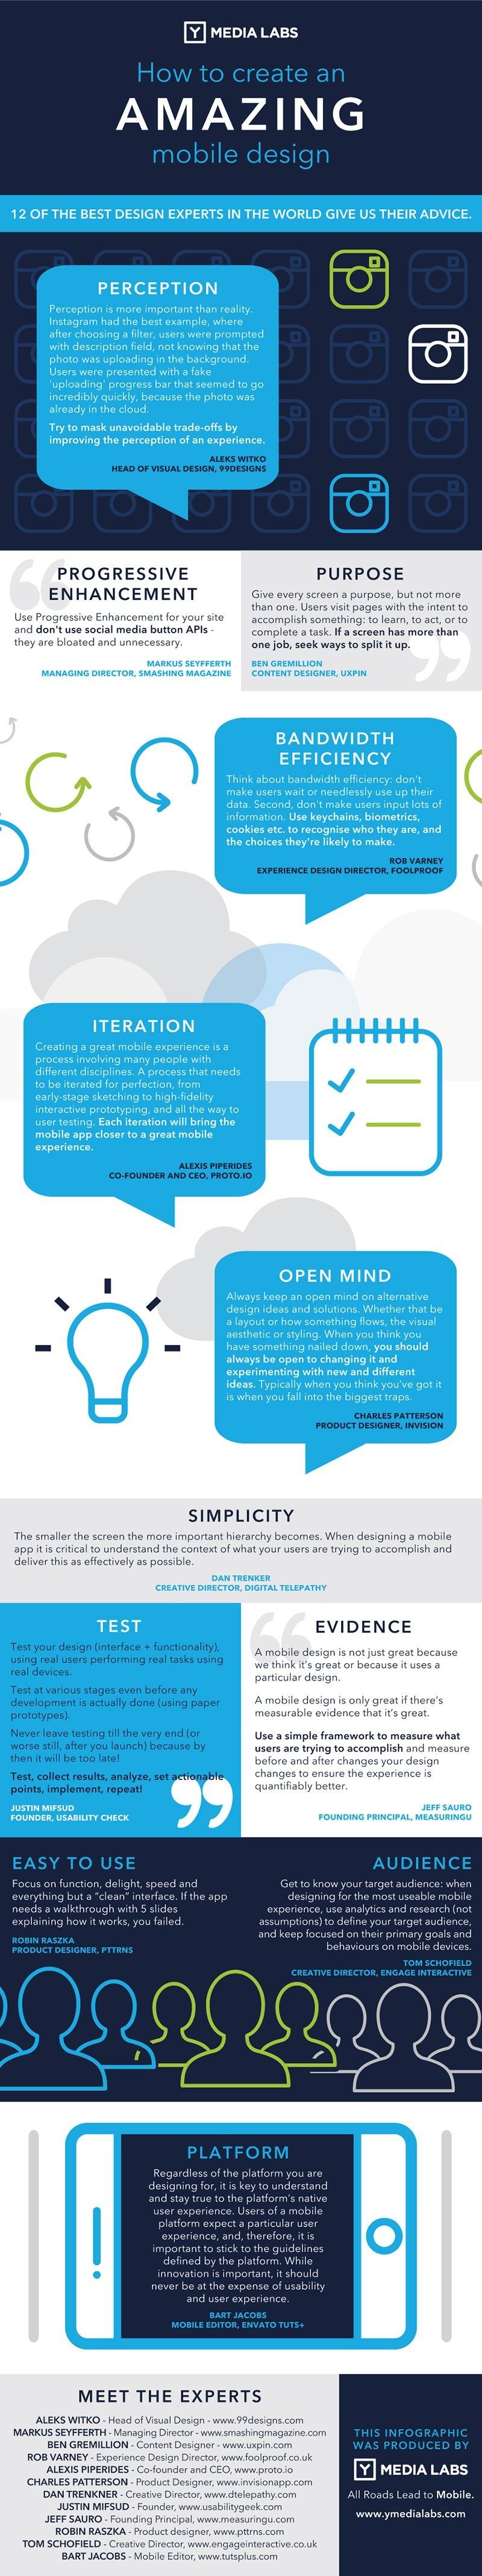 mobile design advice infographic